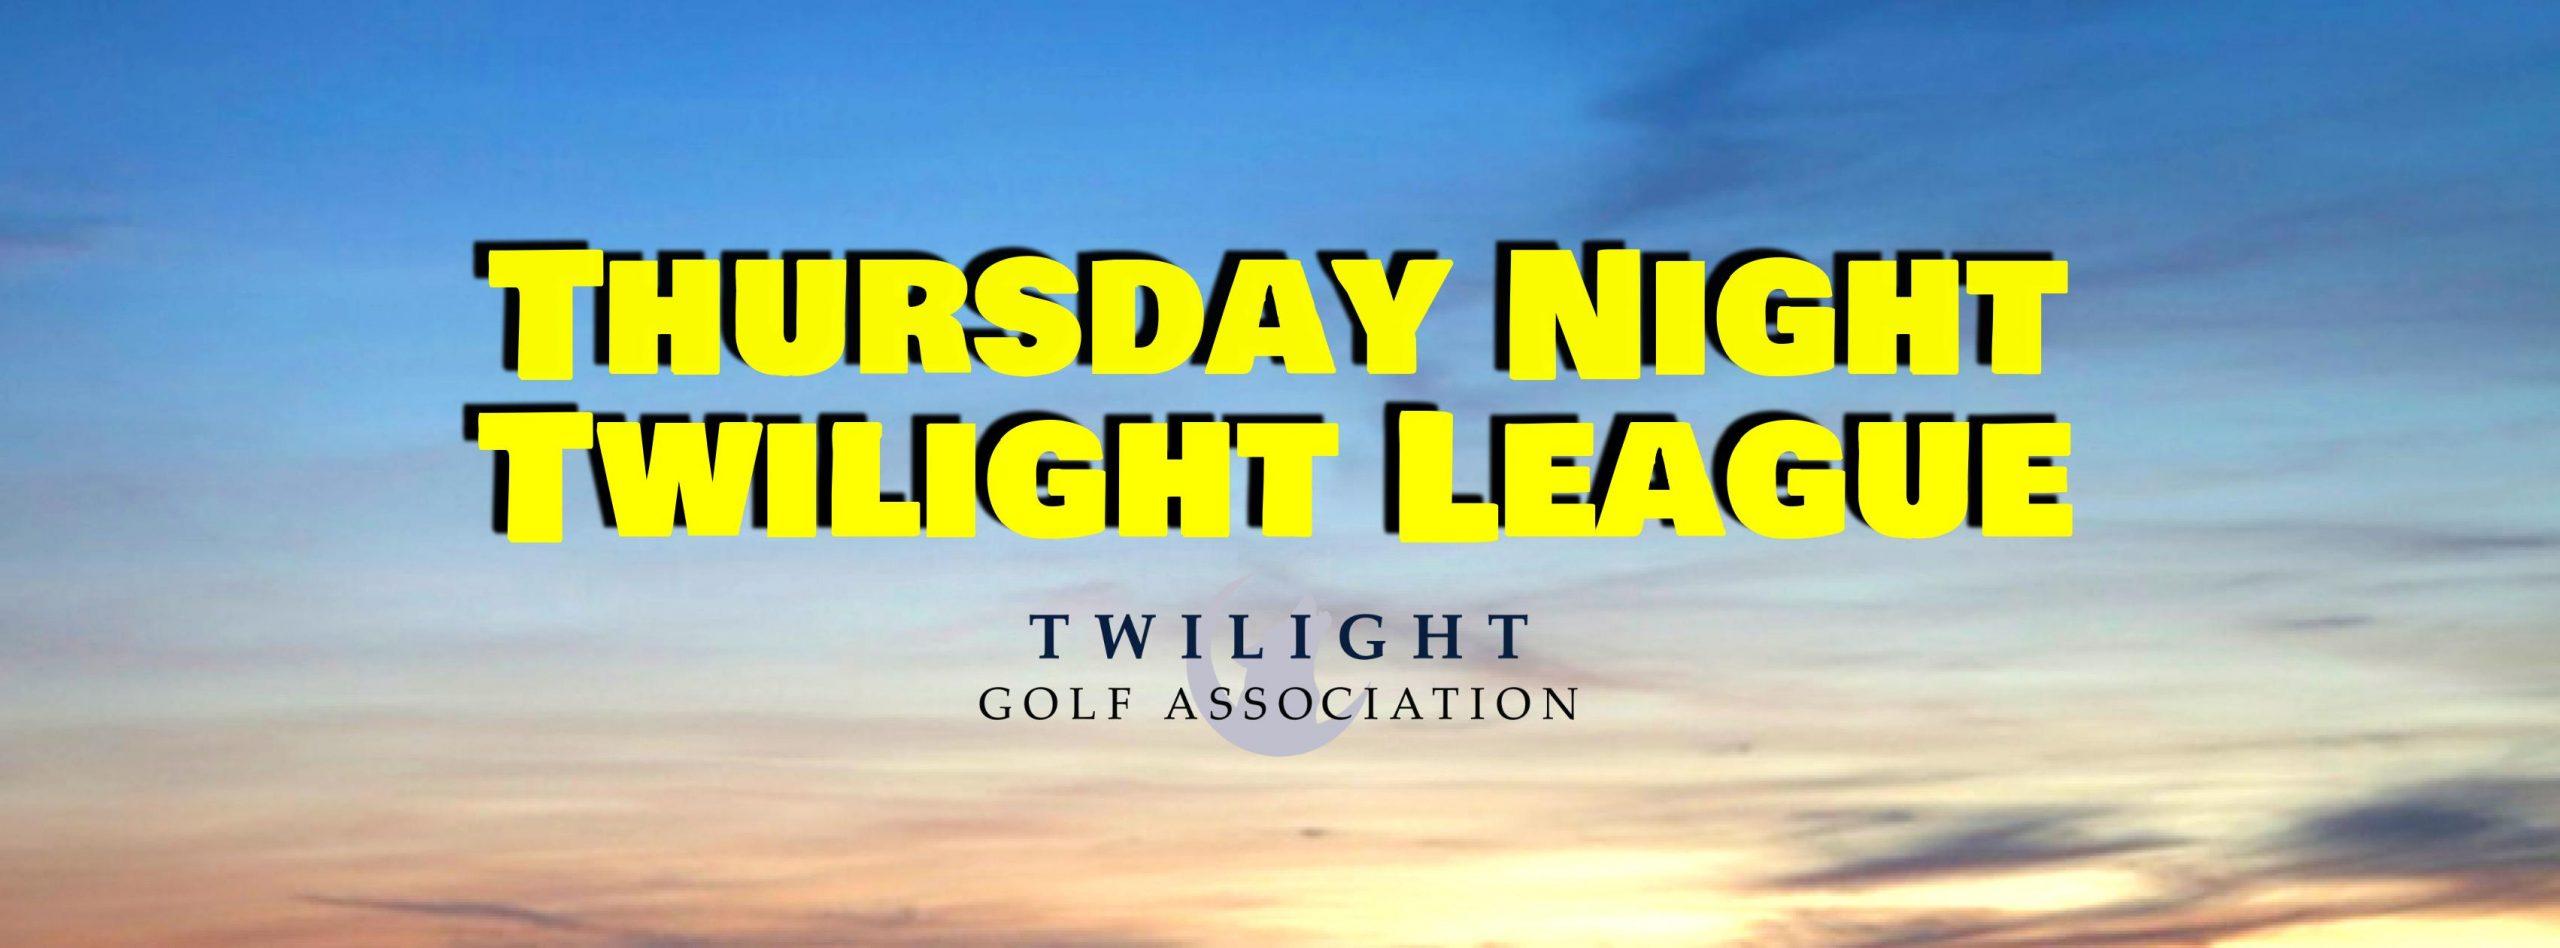 Thursday Twilight League at Ken McDonald Golf Course